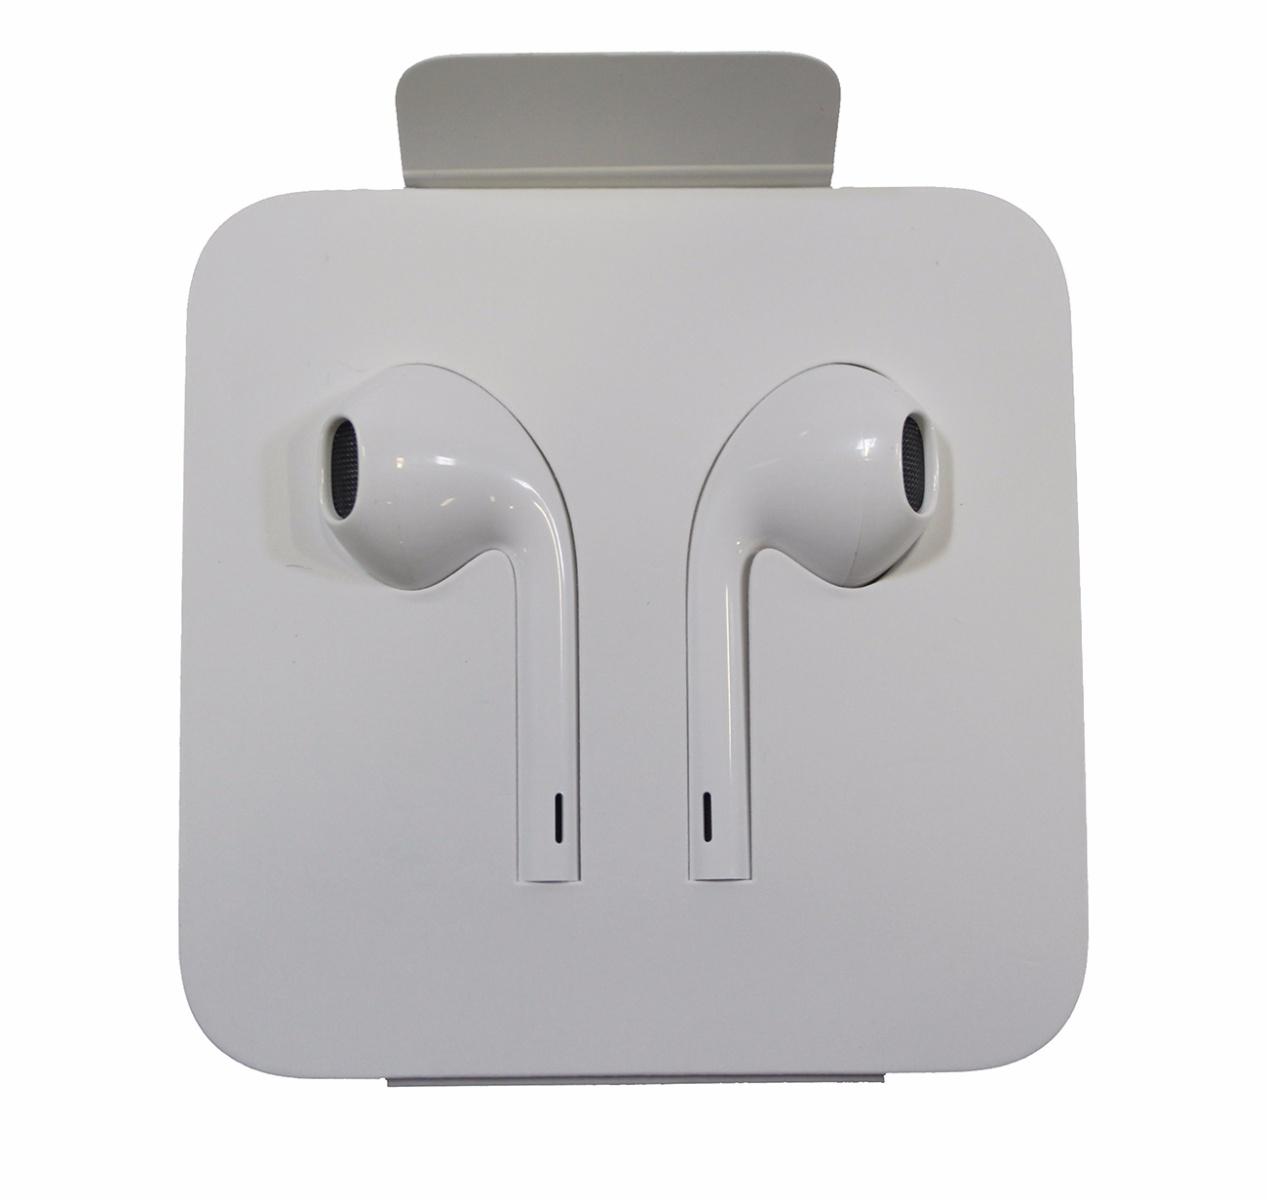 apple headphones. oem genuine apple earpods headset w/ lightning connector iphone x 8 7 mmtn2am/a headphones